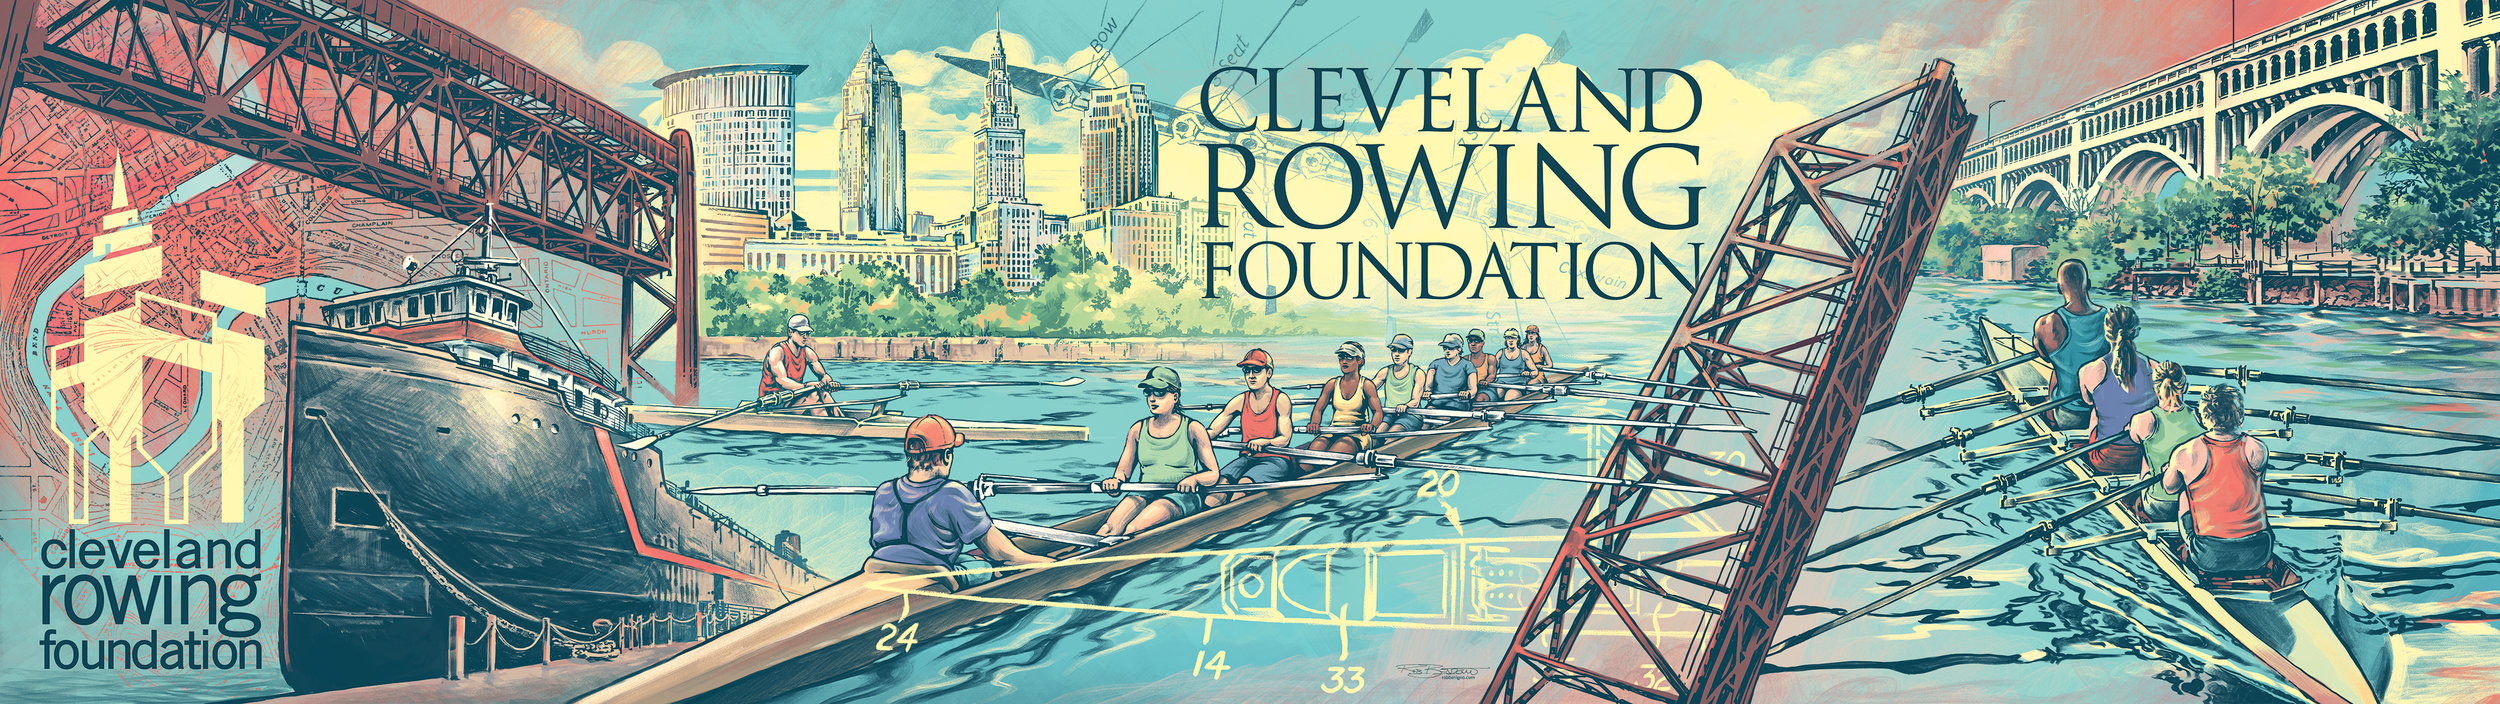 Cleveland_RowingFINAL_flattened_downsized copy.jpg